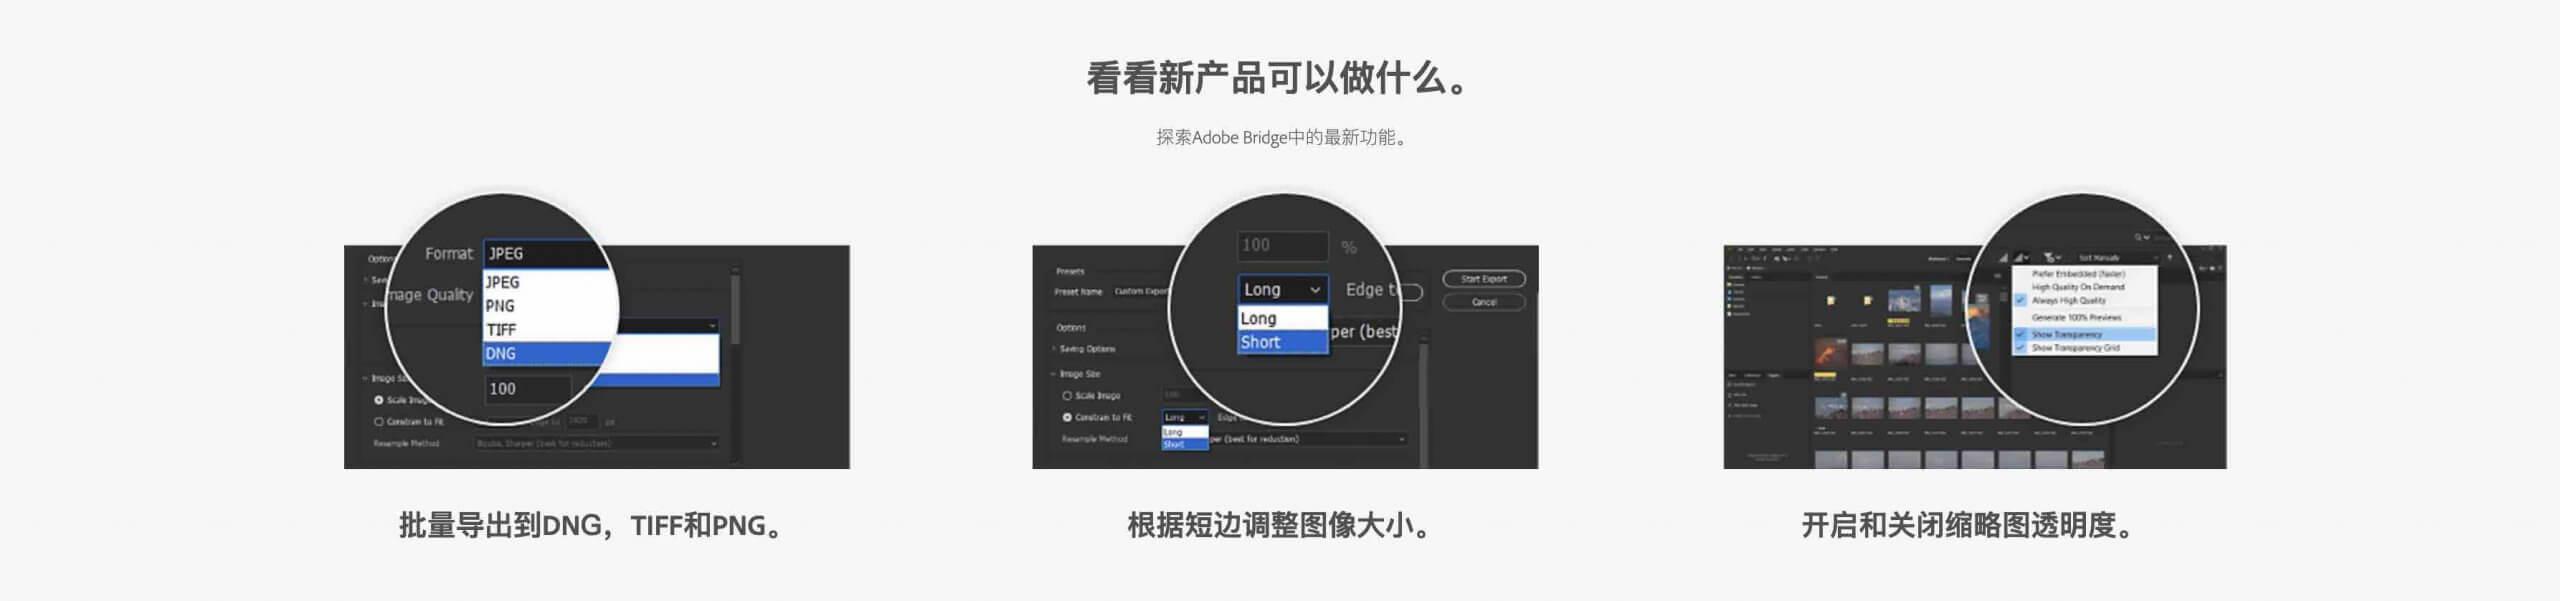 Adobe Bridge 2020 SP插图2